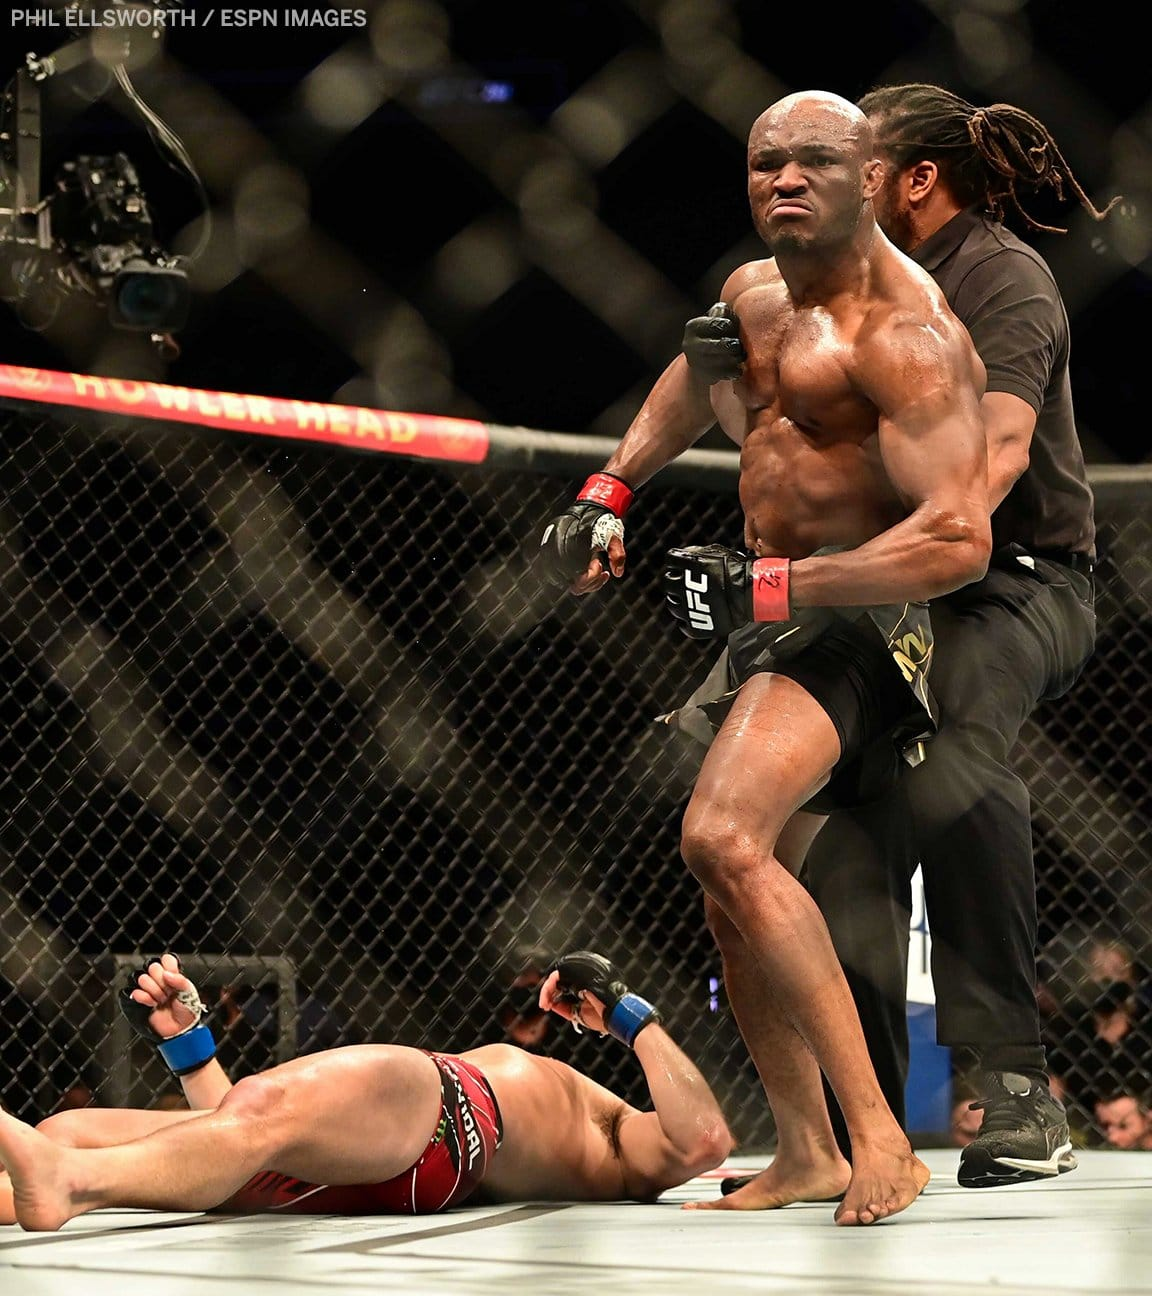 Masvidal: Kamaru Usman Deserves His Win